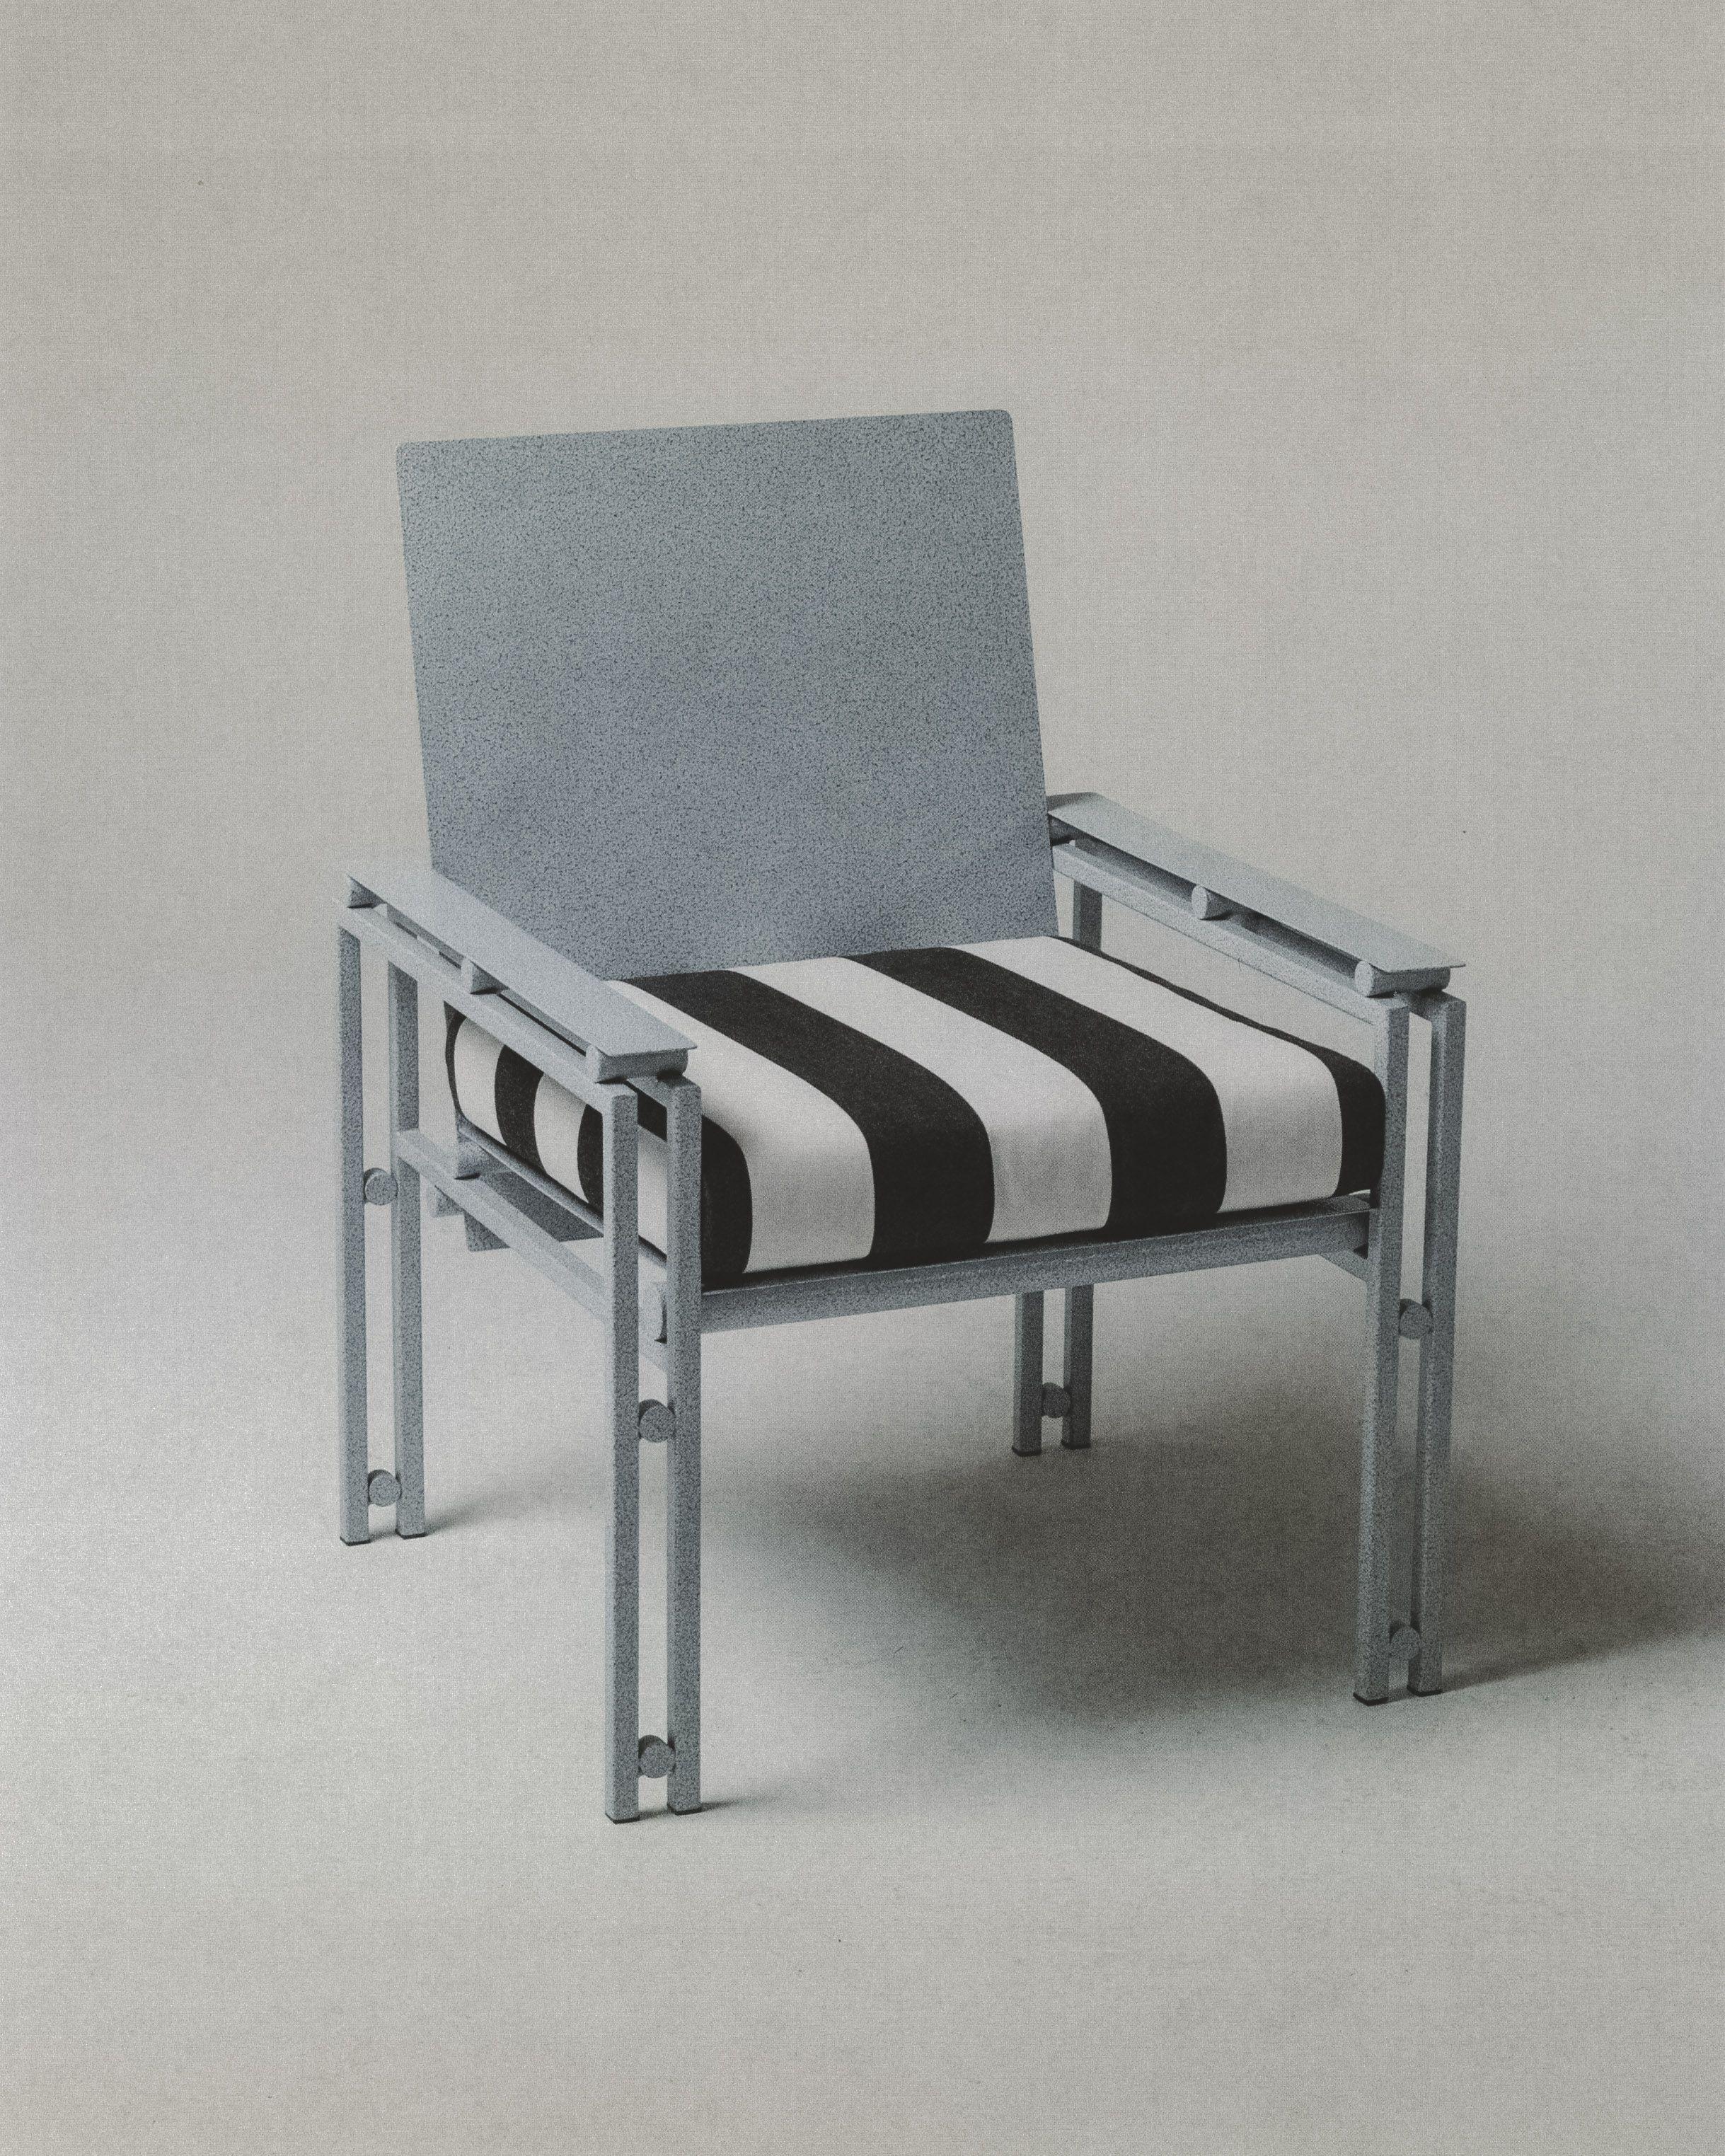 Suspension Metal Lounge product image 0